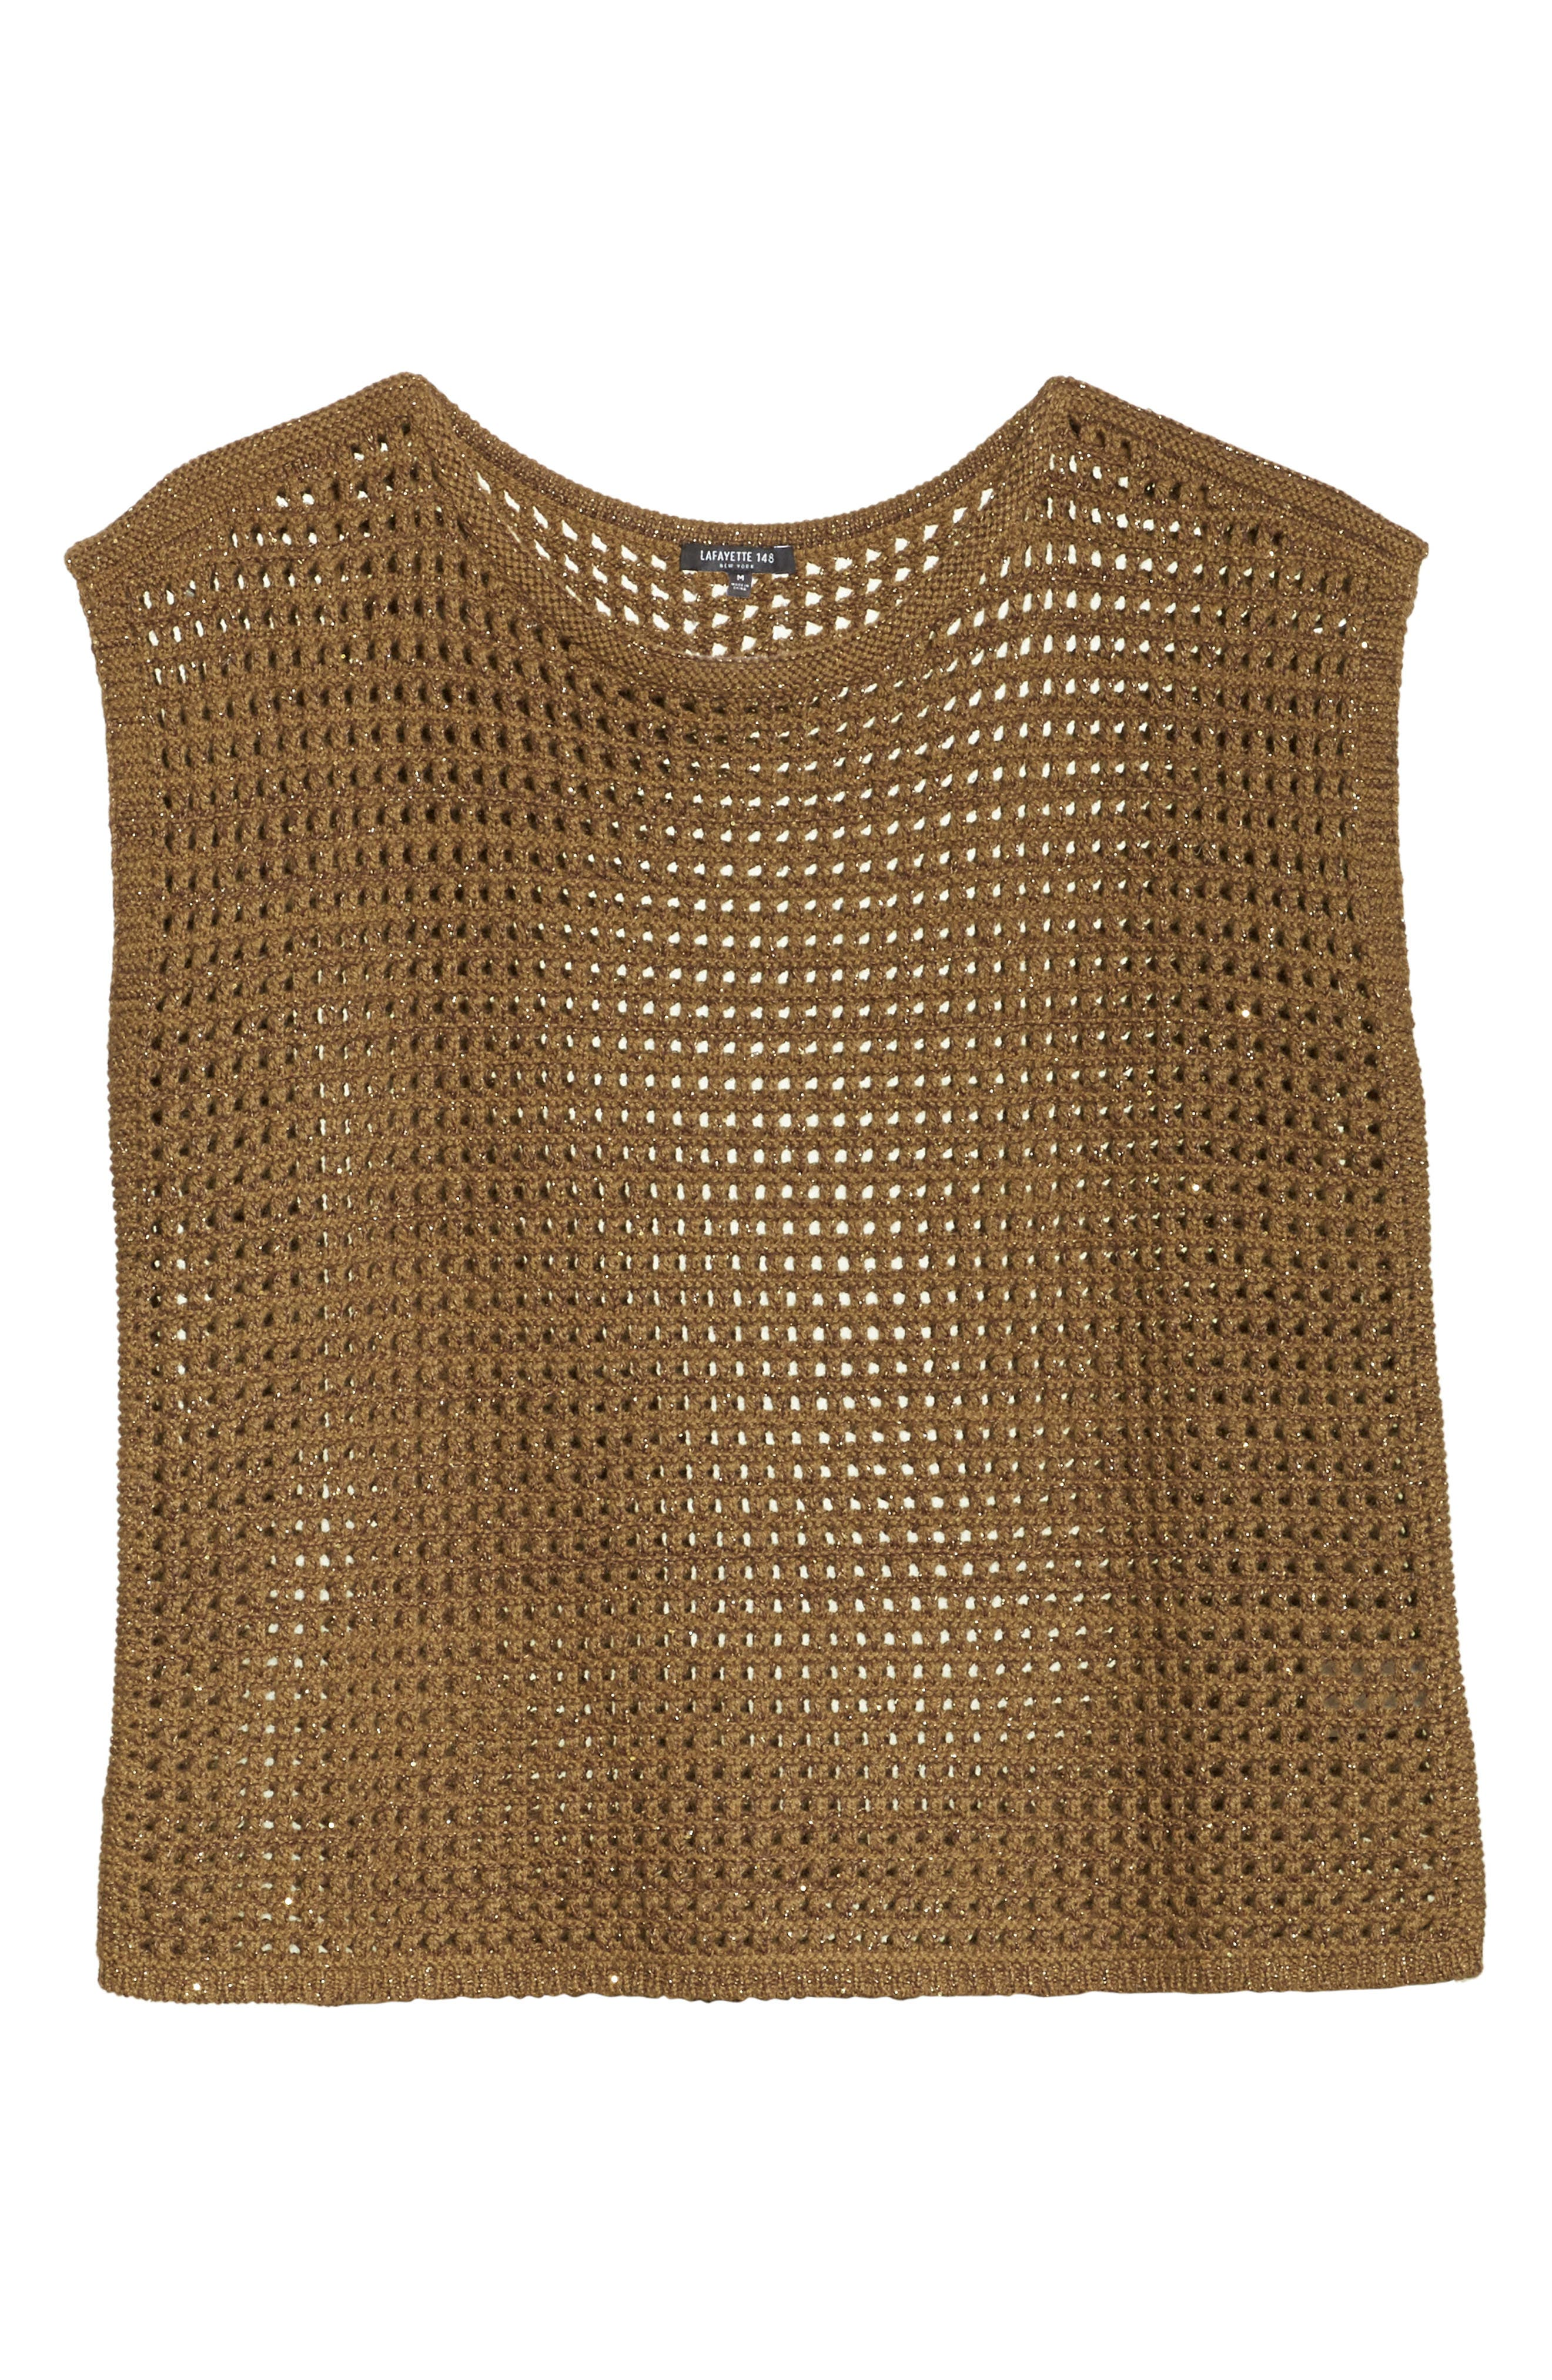 Cashmere Open Stitch Sequin Sweater,                             Alternate thumbnail 6, color,                             Sequoia Metallic